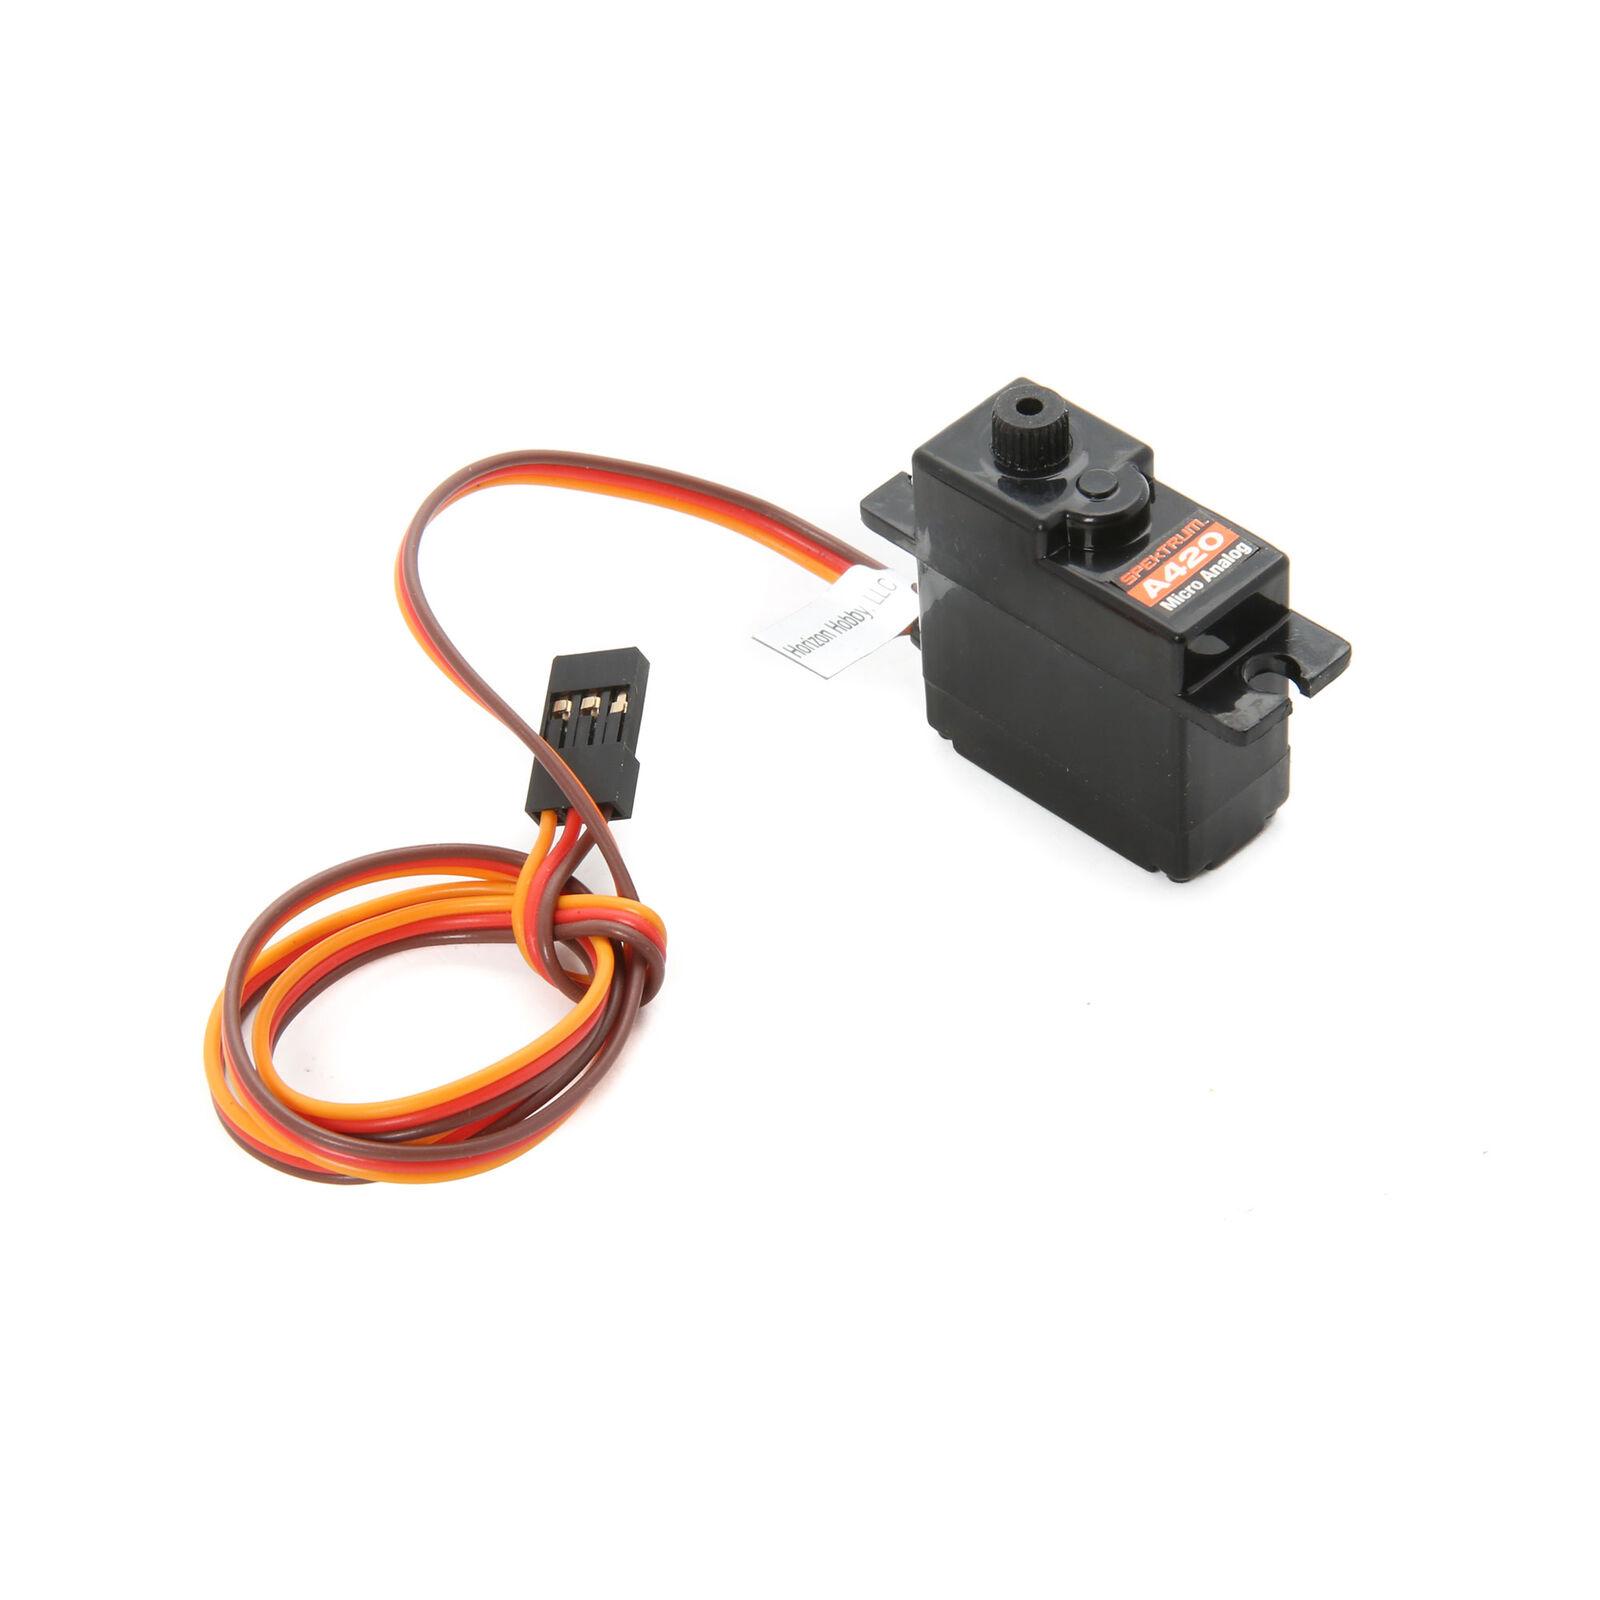 Servo 17g analogique (câble 400mm)